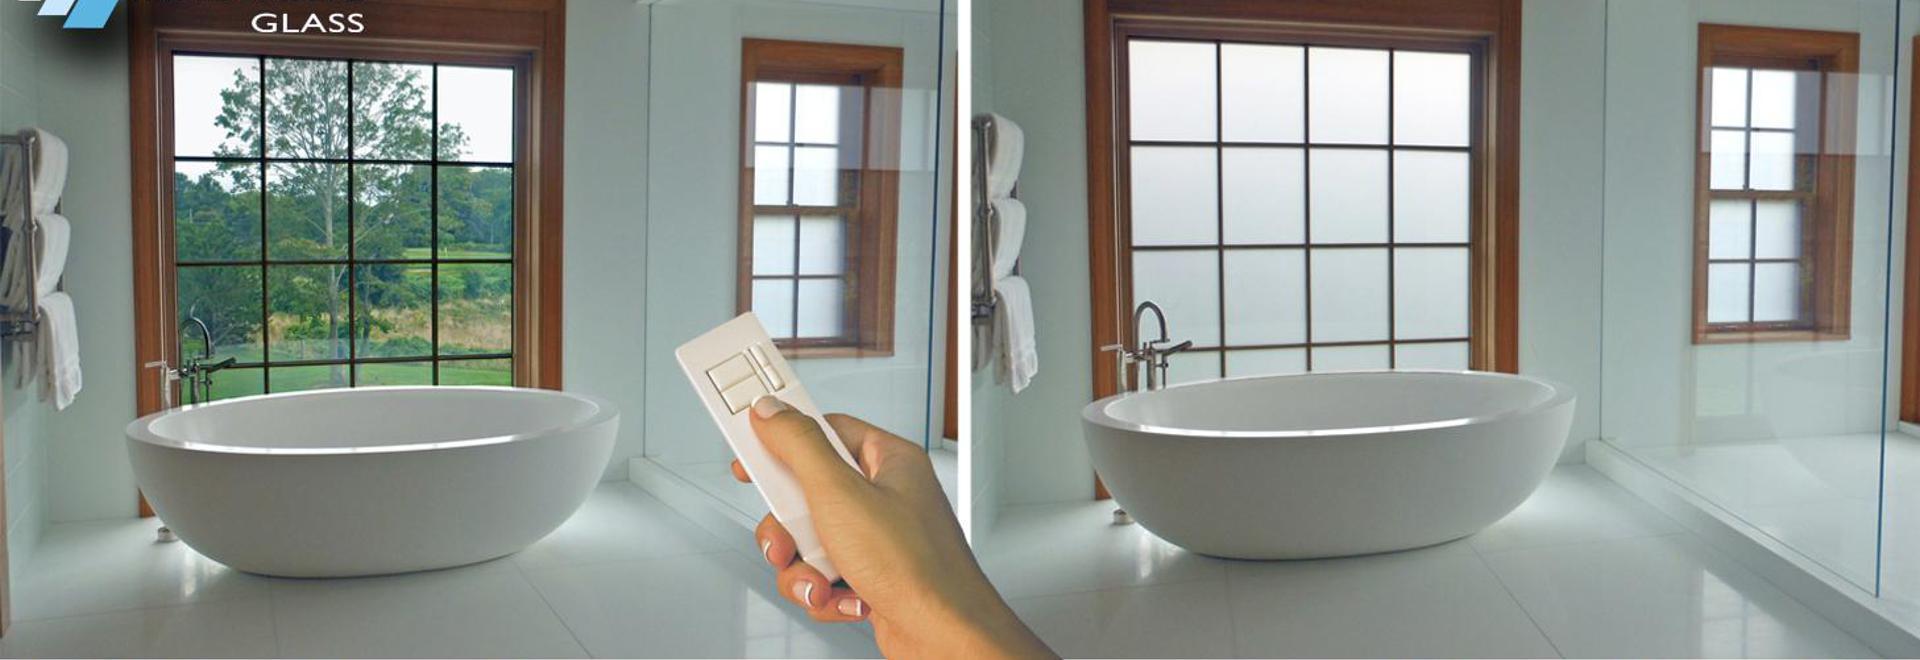 Privatleben Glas Badezimmer